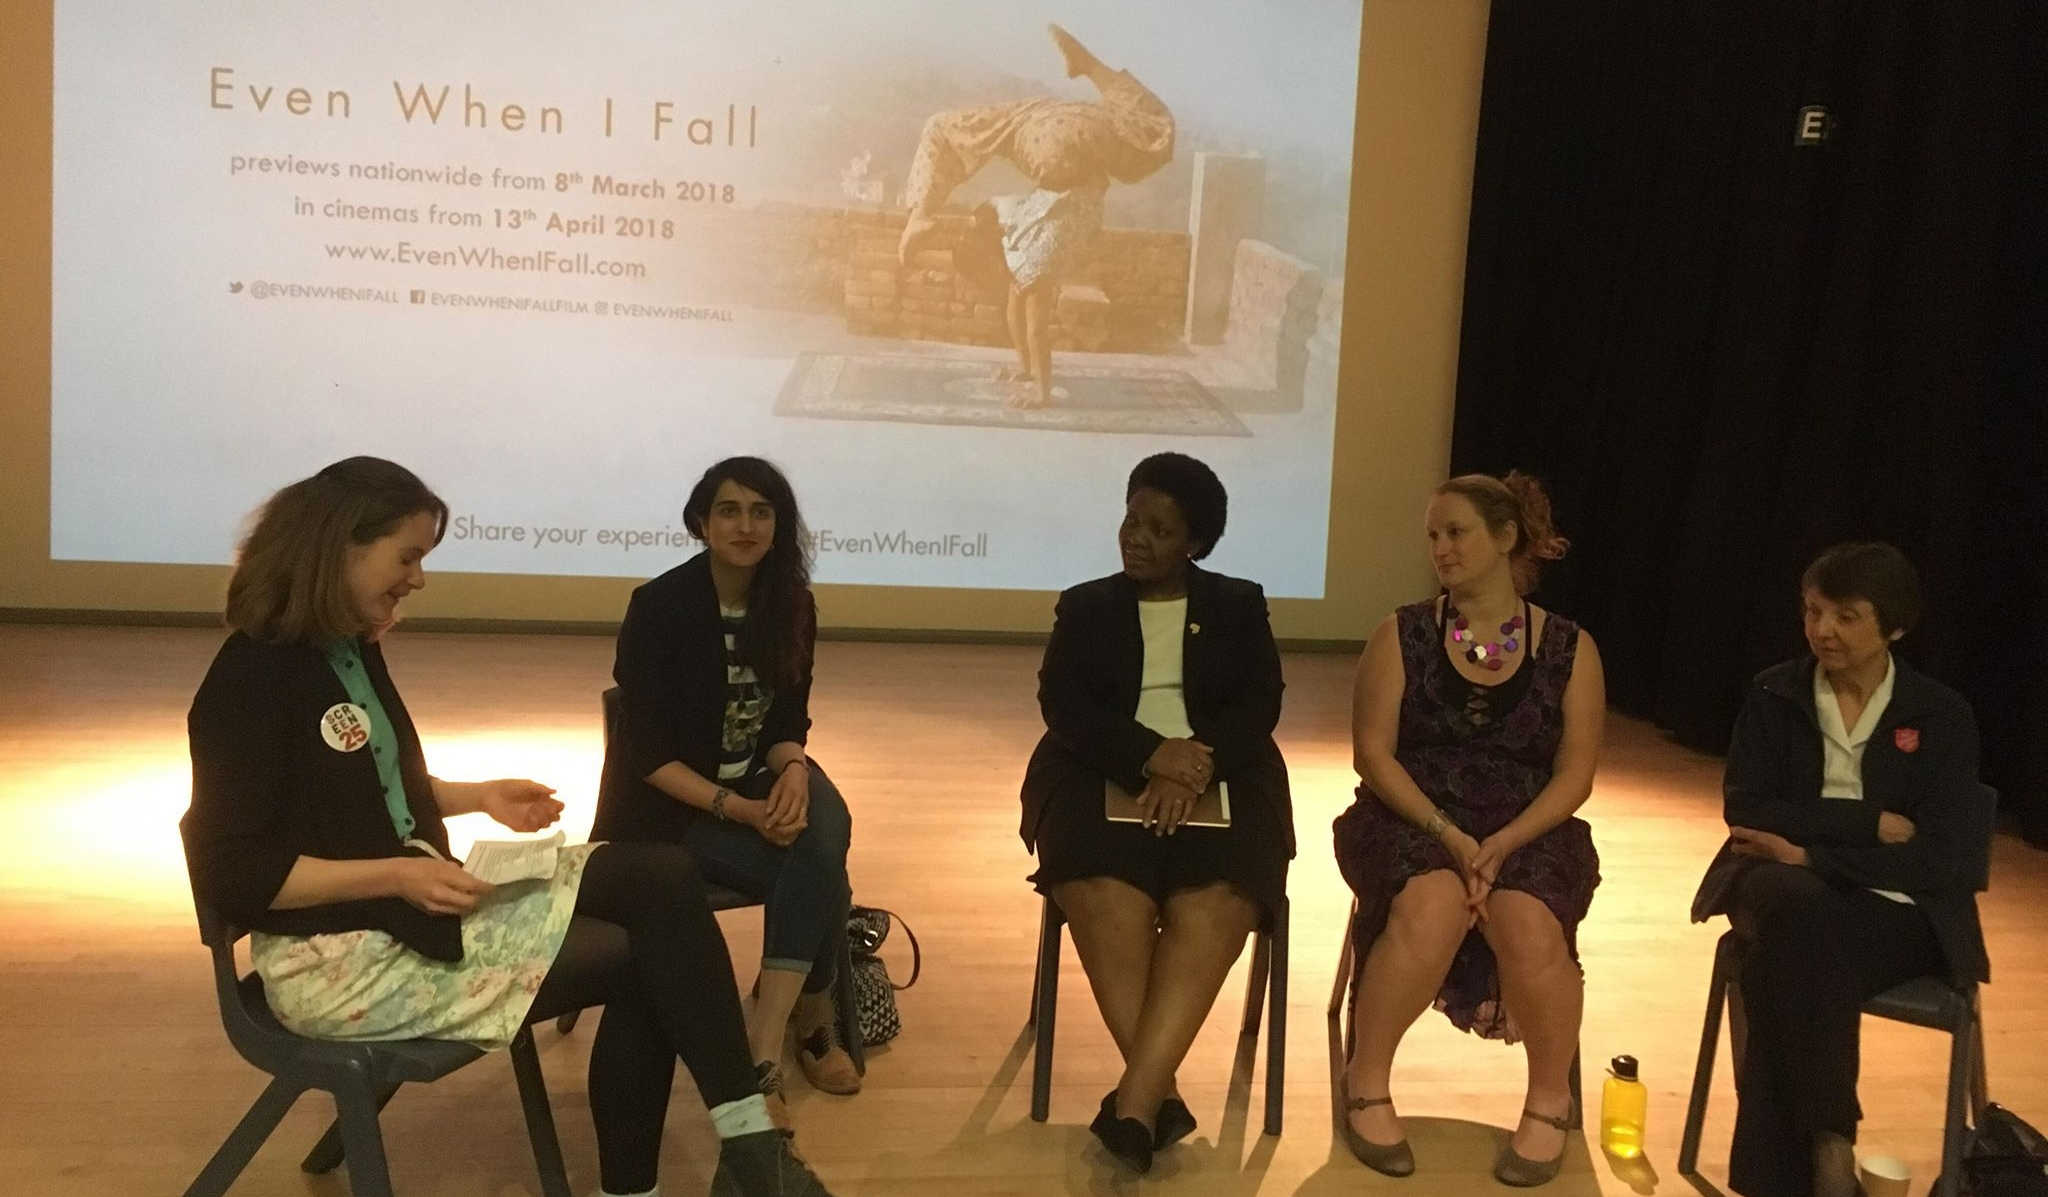 From left: Katie Brandwood (Screen25), Saima Raza (CCAT), Debbie Ariyo (AFRUCA), Anna Strickland (Circus Kathmandu Foundation),Lieut.-Colonel Diane Payne (The Salvation Army)